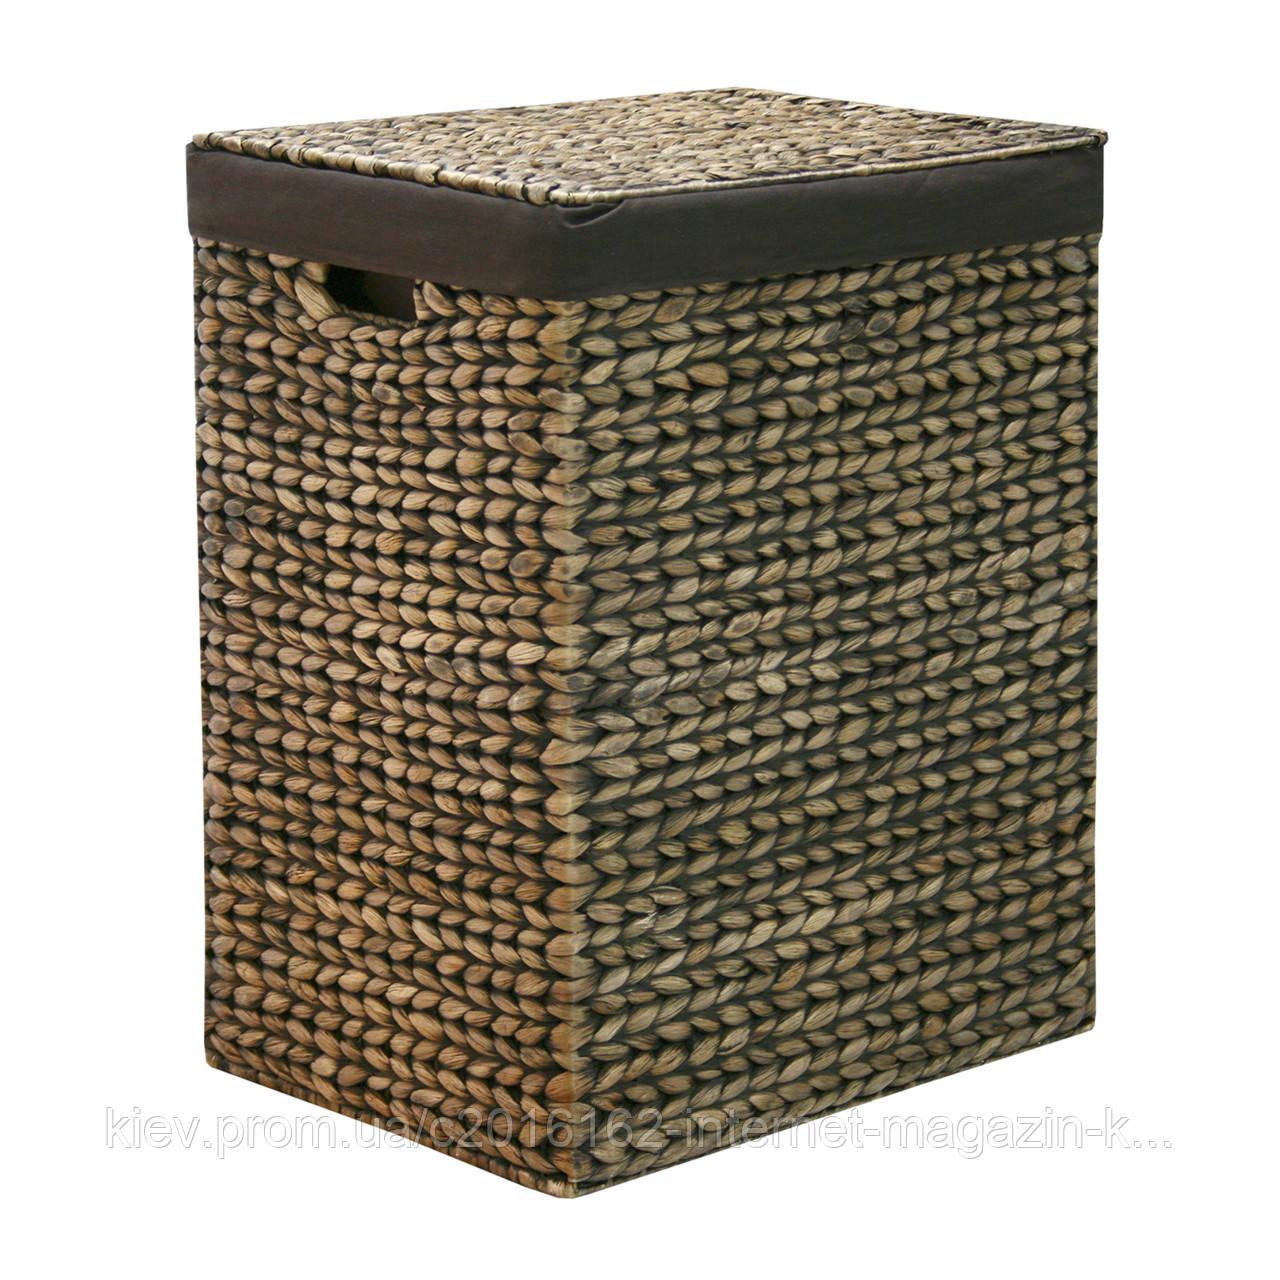 Корзина для белья плетеная с крышкой Home4You MAYA-1  44x33xH56cm  dark brown